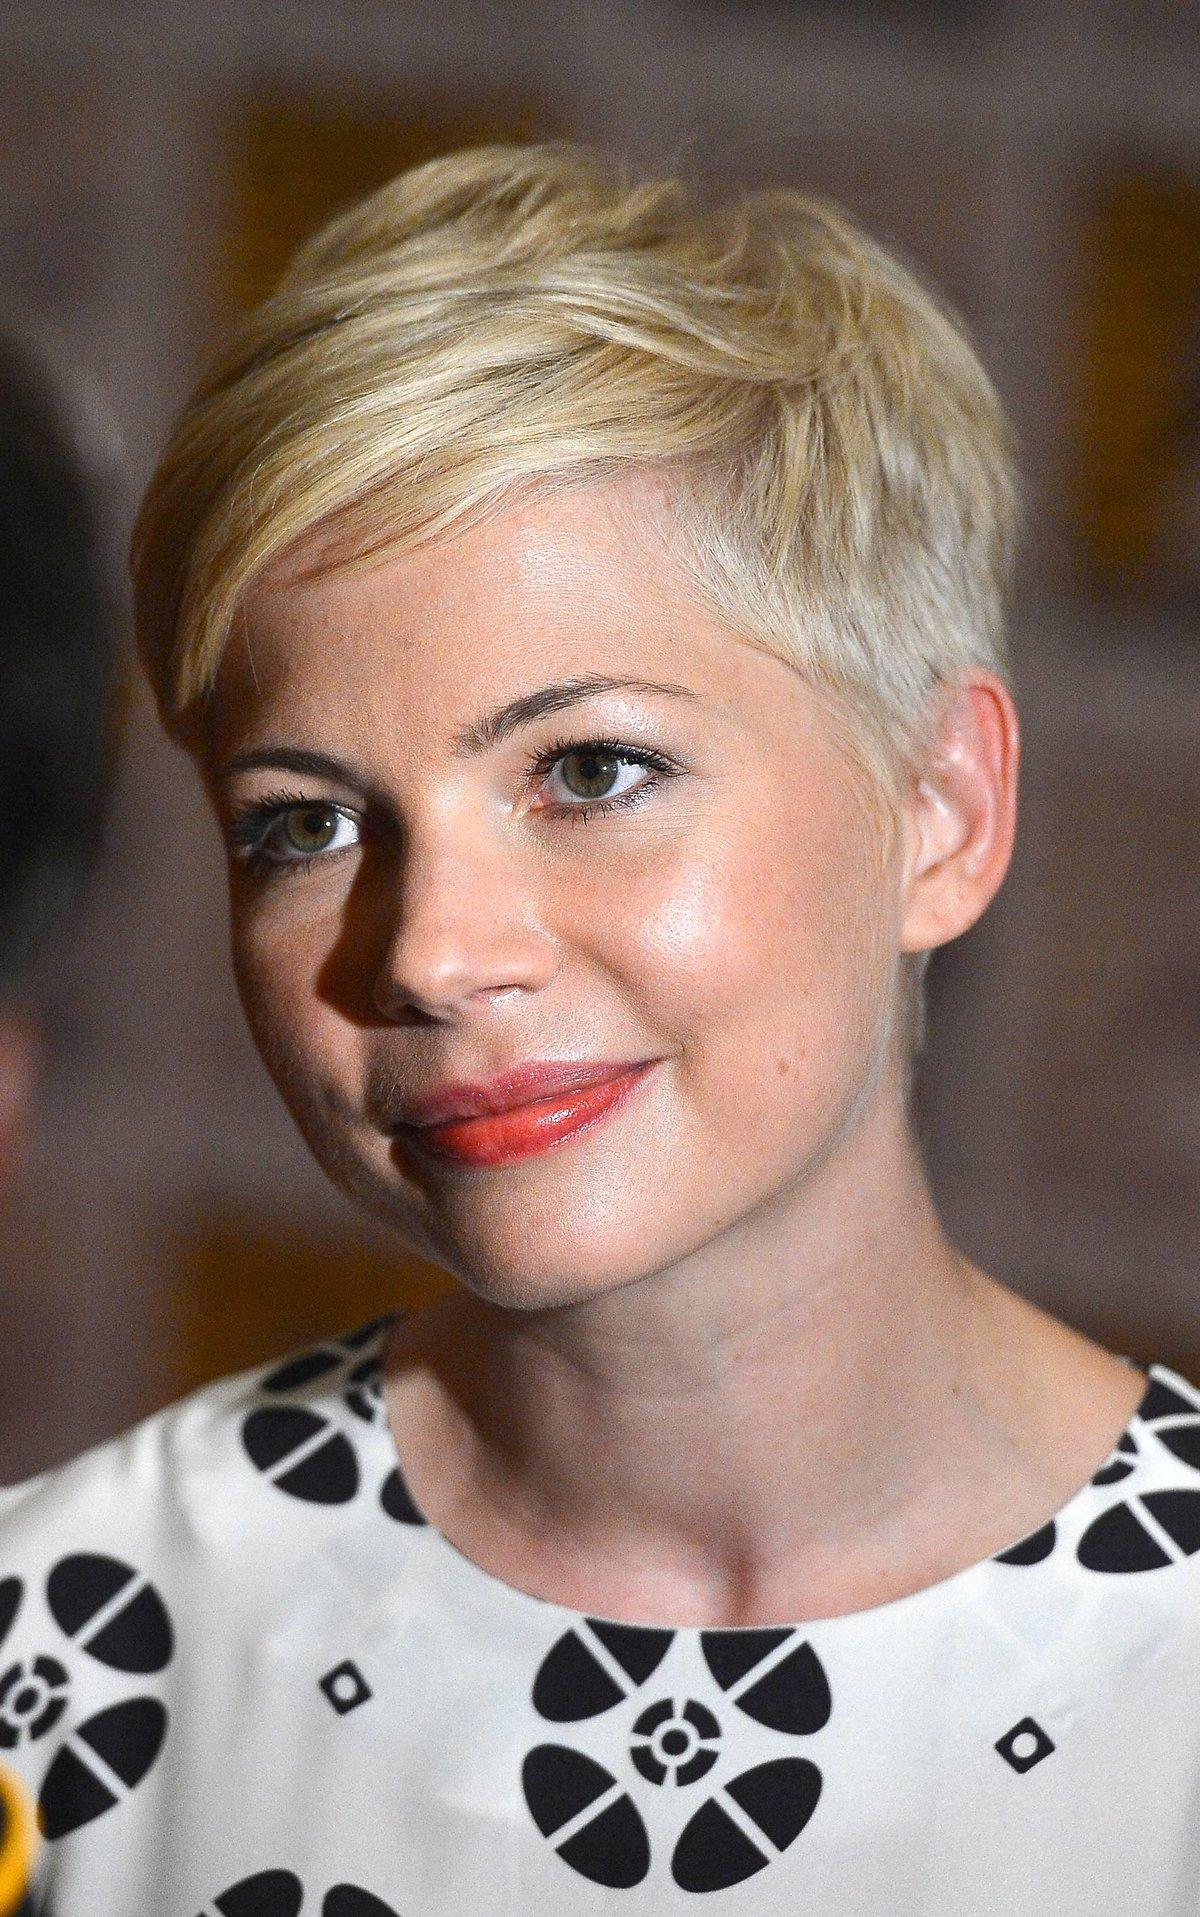 Короткие причёски на круглое лицо фото